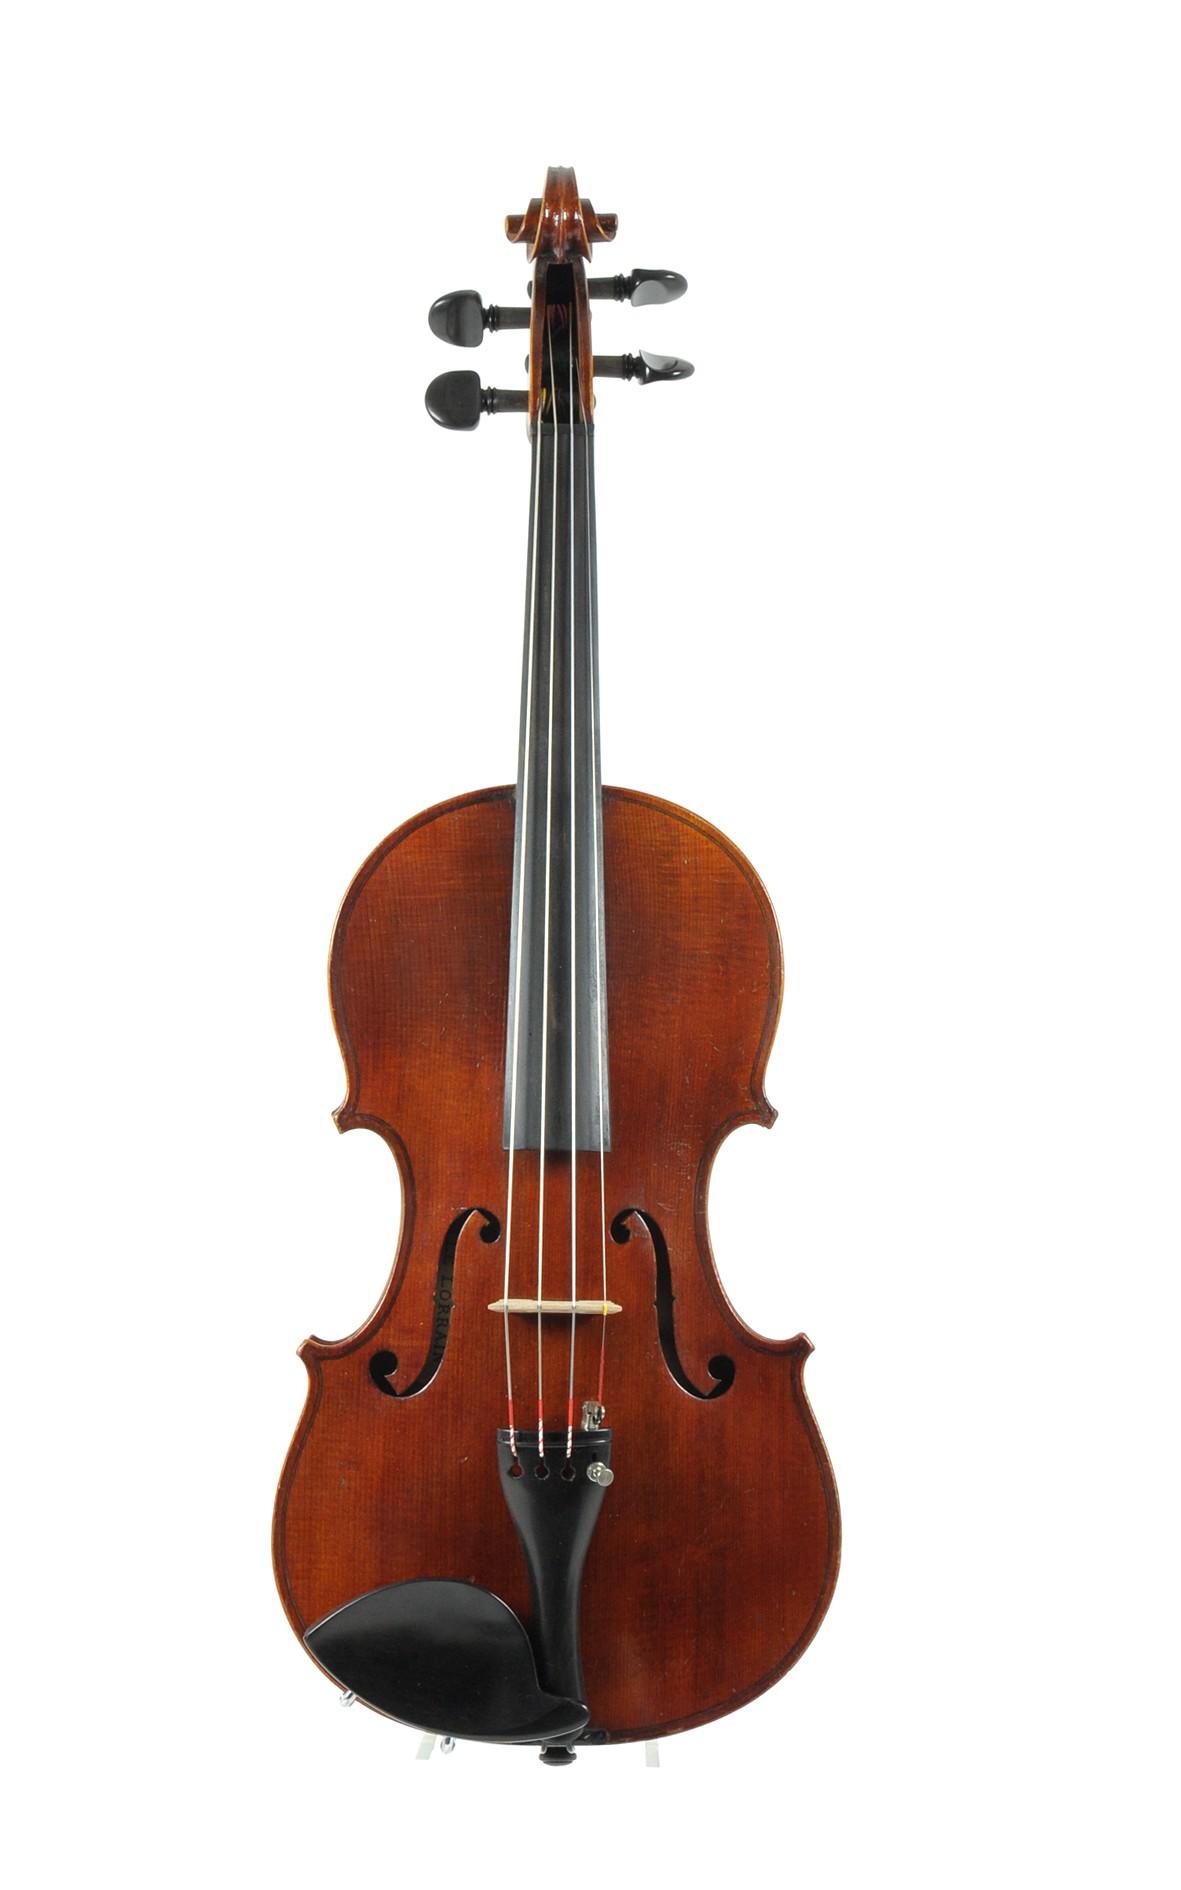 J.T.L. violin, Le Lorrain, approx. 1910 - top